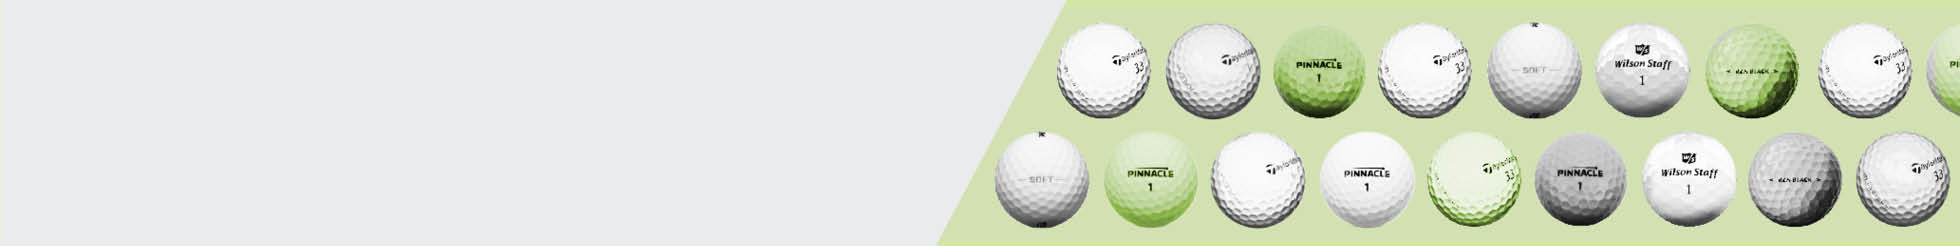 Damen Golfbälle